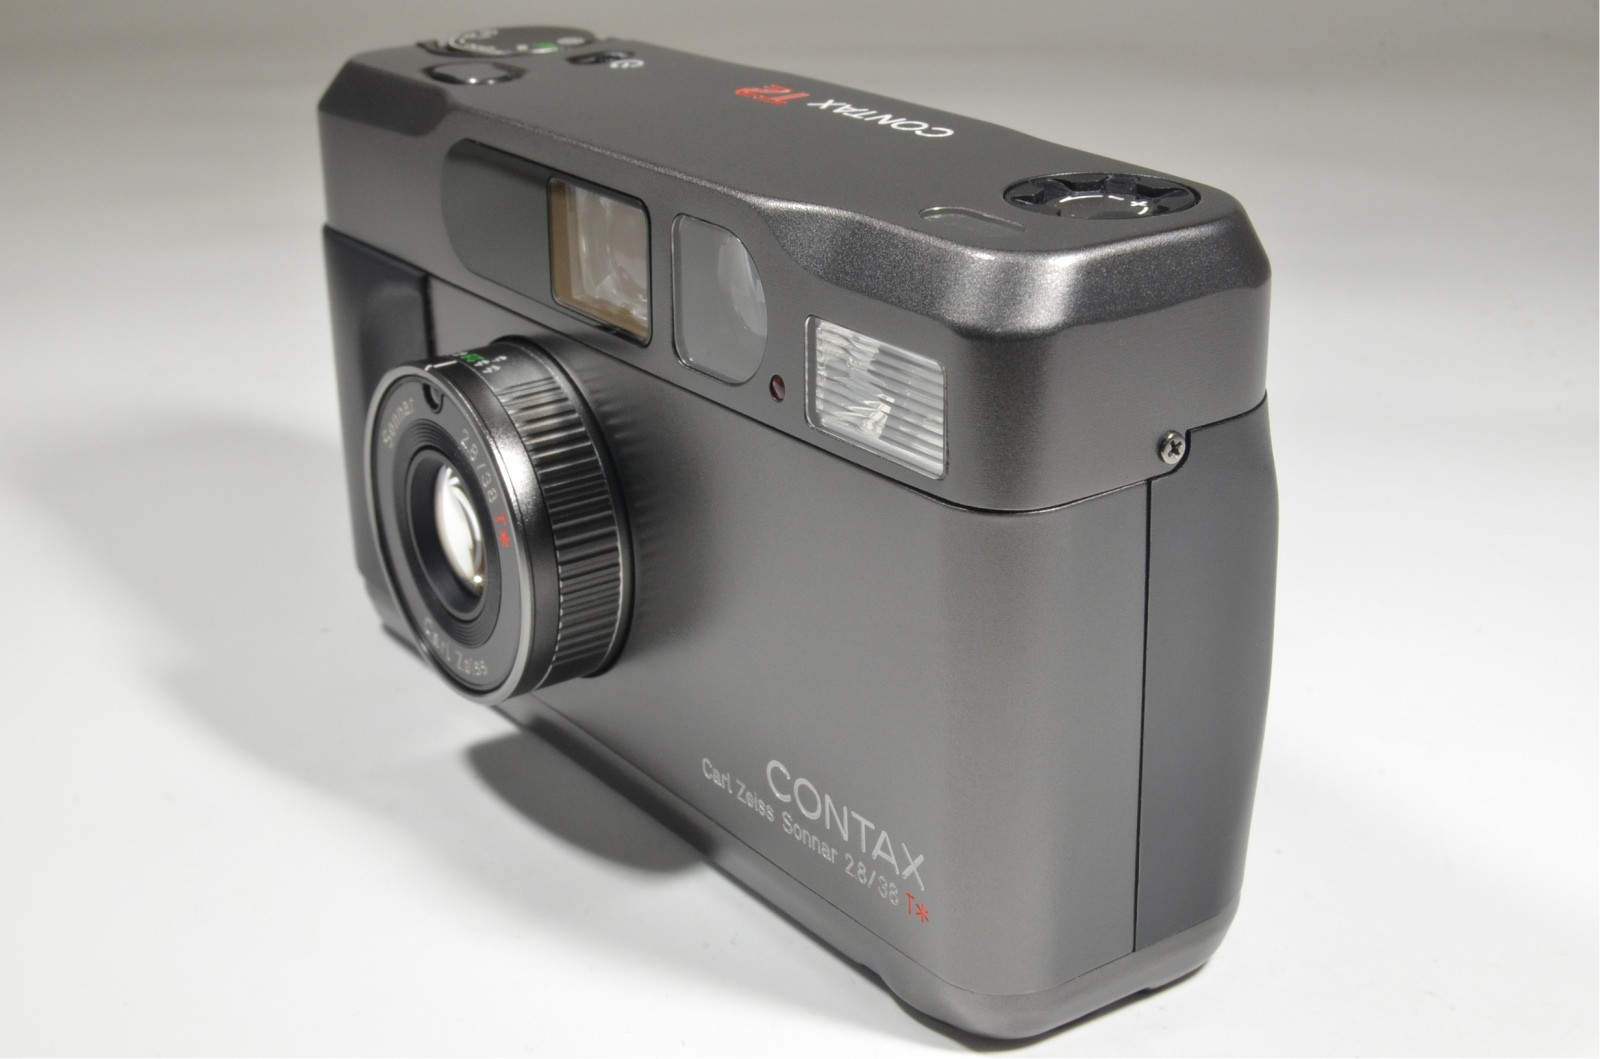 contax t2 data back titanium black point & shoot 35mm film camera